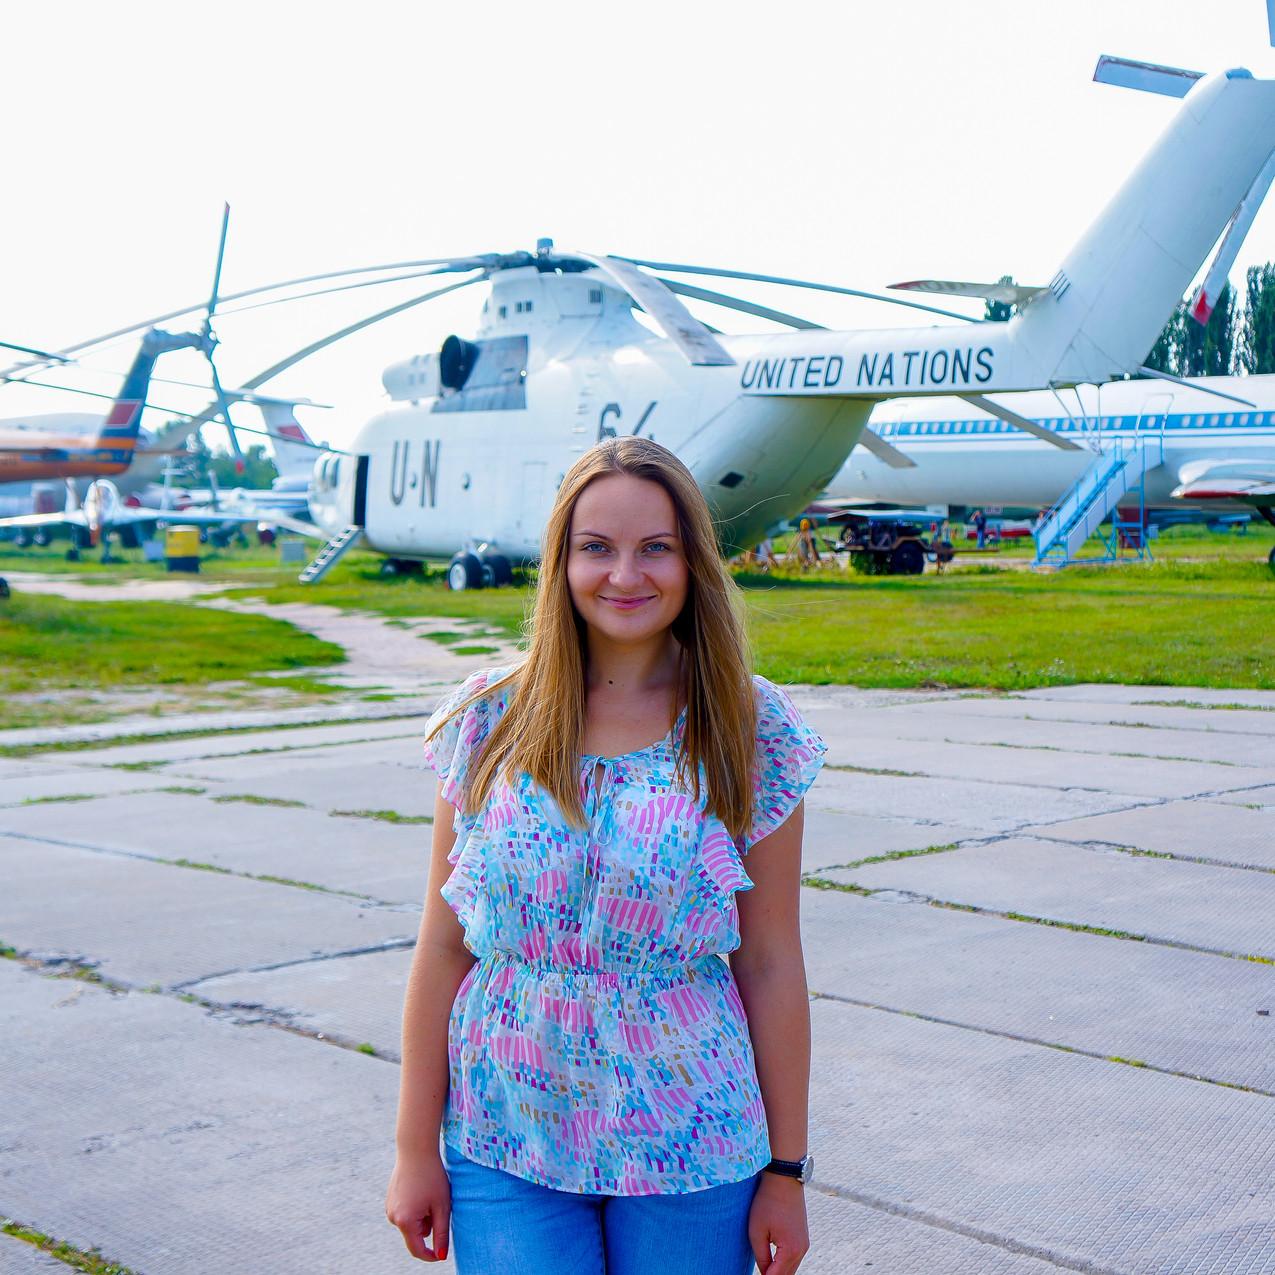 Kyiv National Aviation Museum